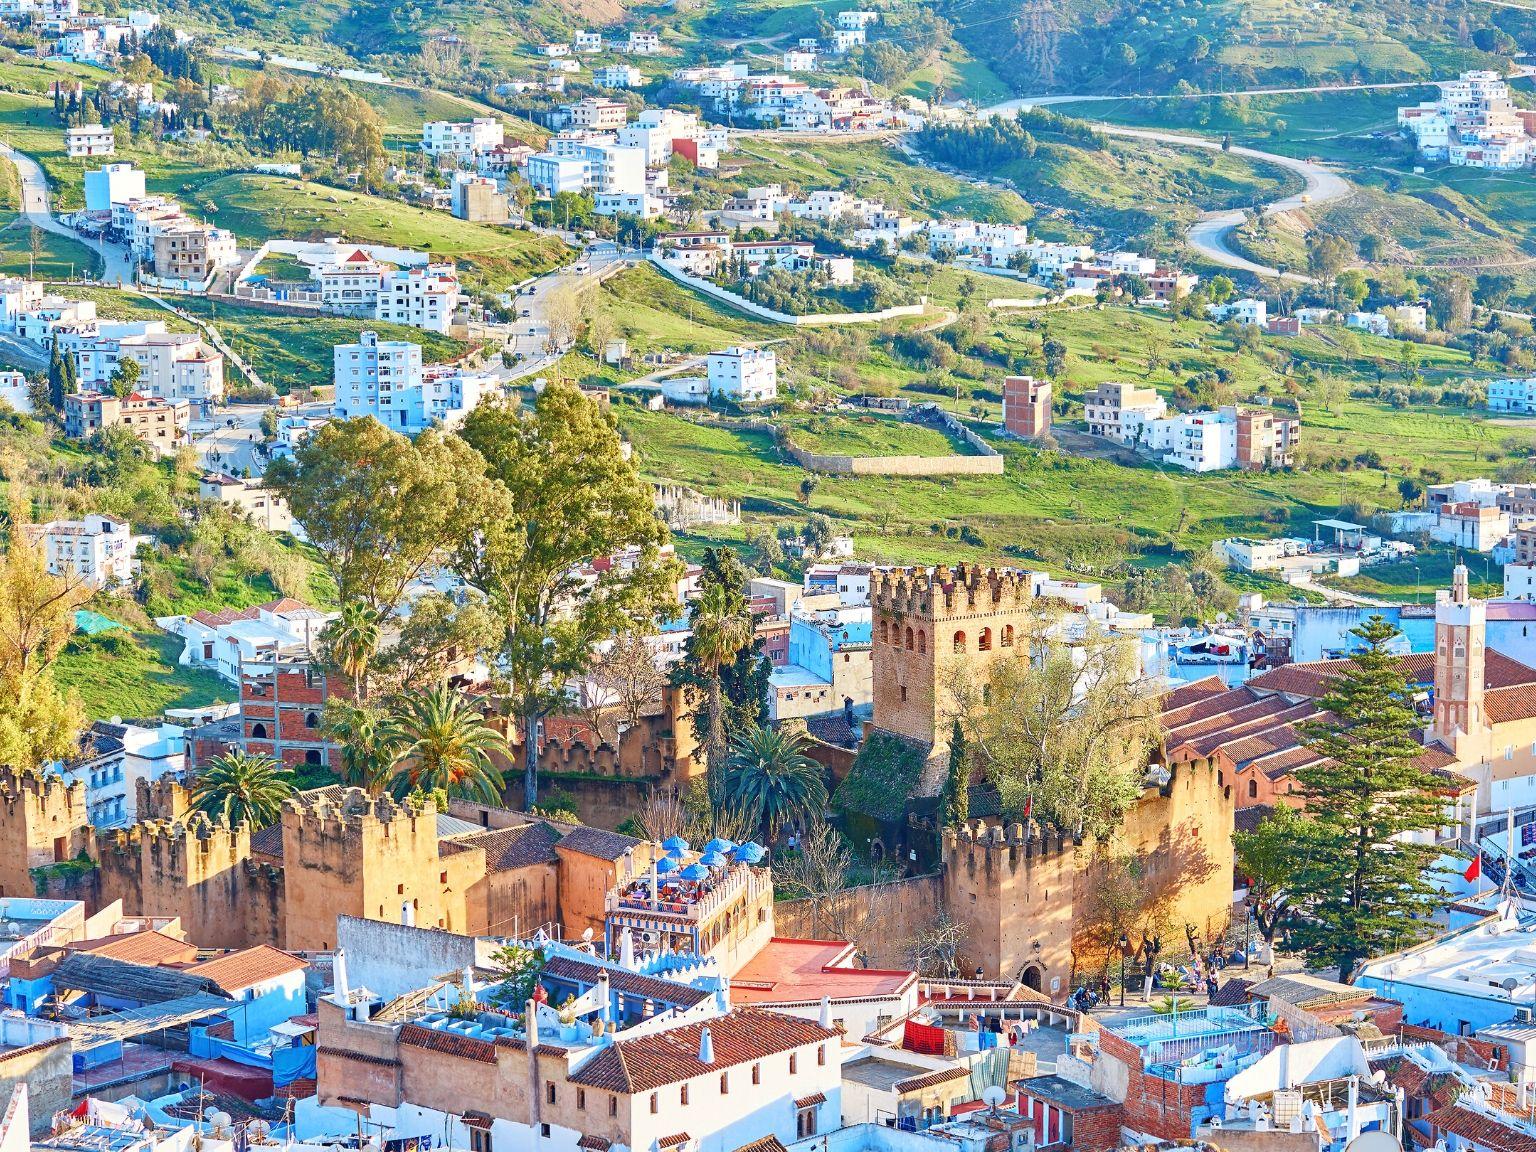 Region Tanger-Tetuan-Alhucemas Marruecos